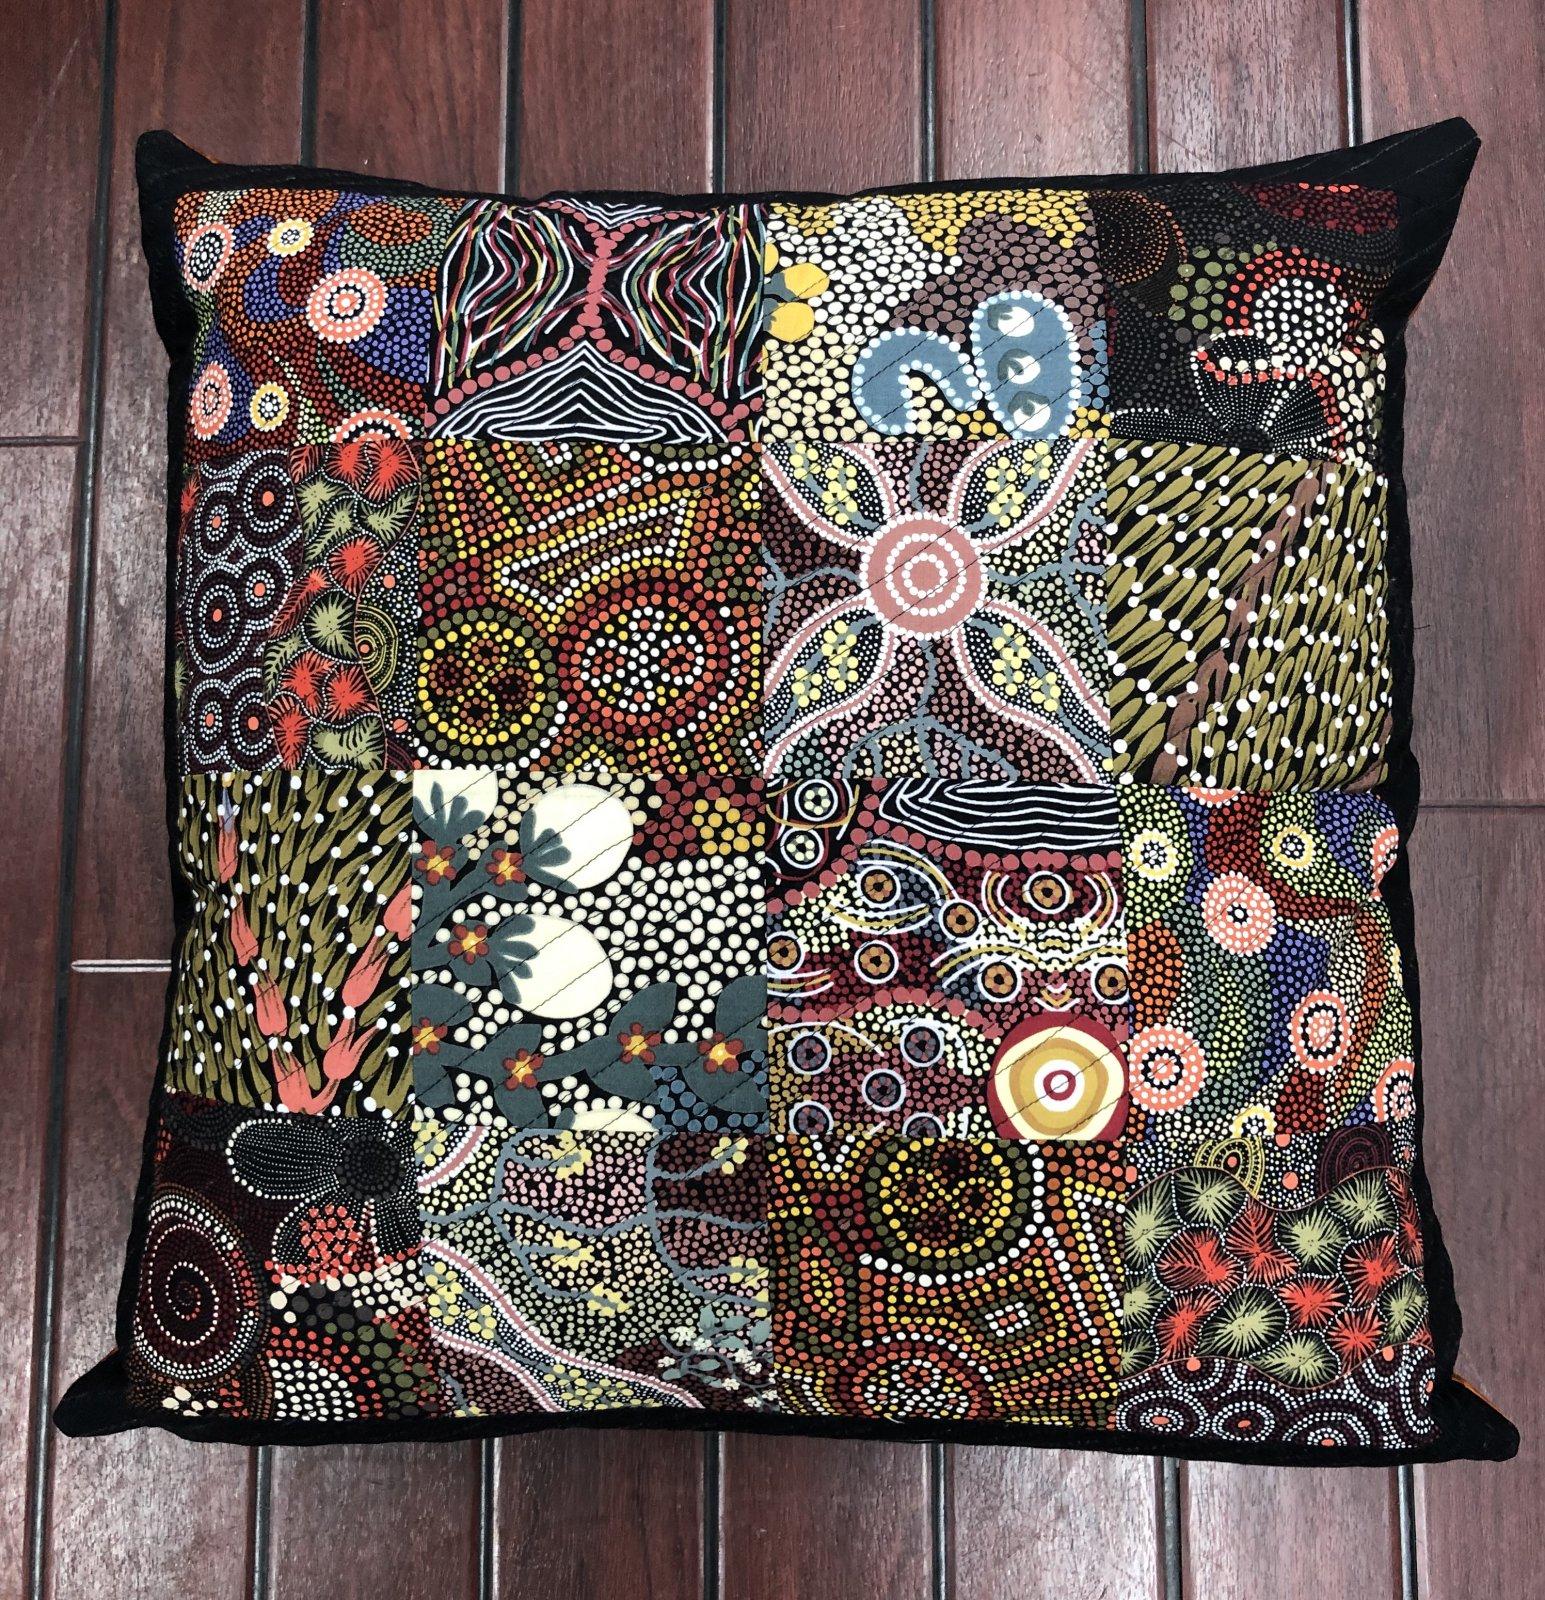 Bush Spice Cushion Pattern